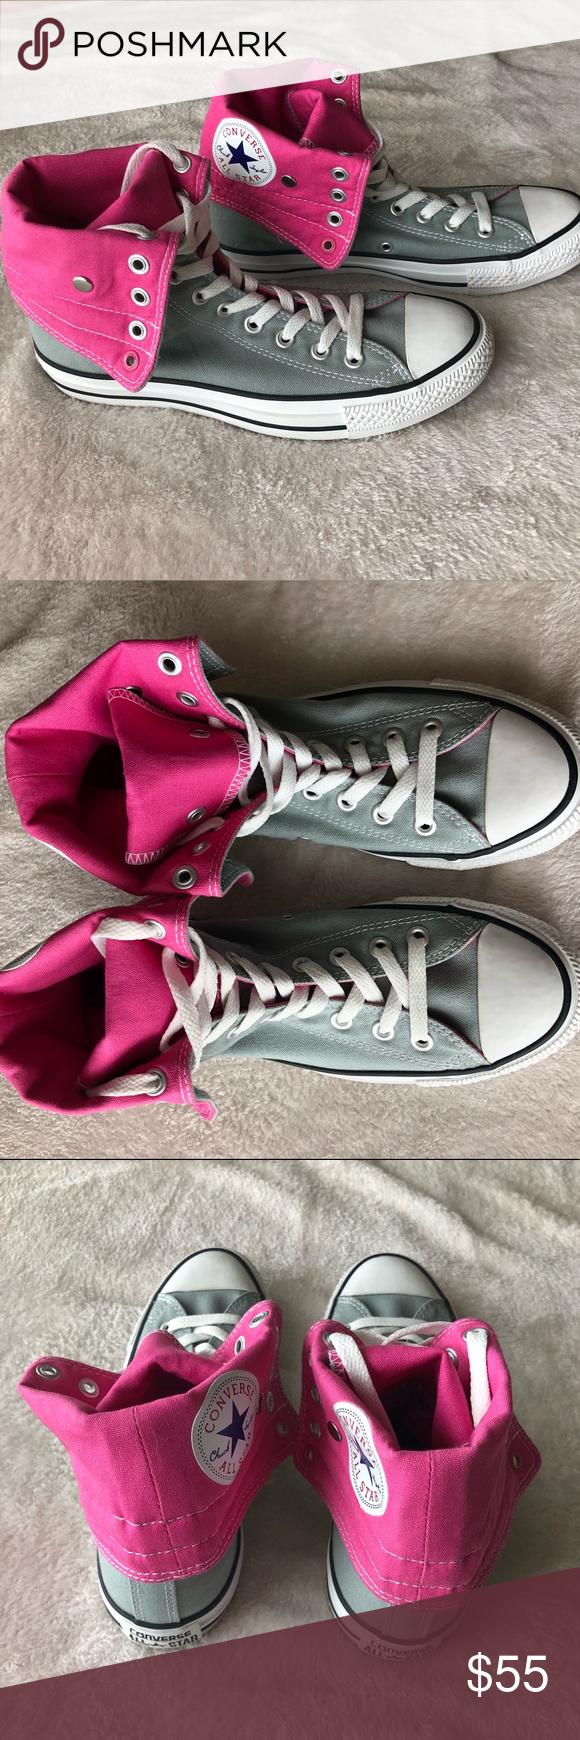 849ea7200b20 NWOT Pink   Gray High-Top